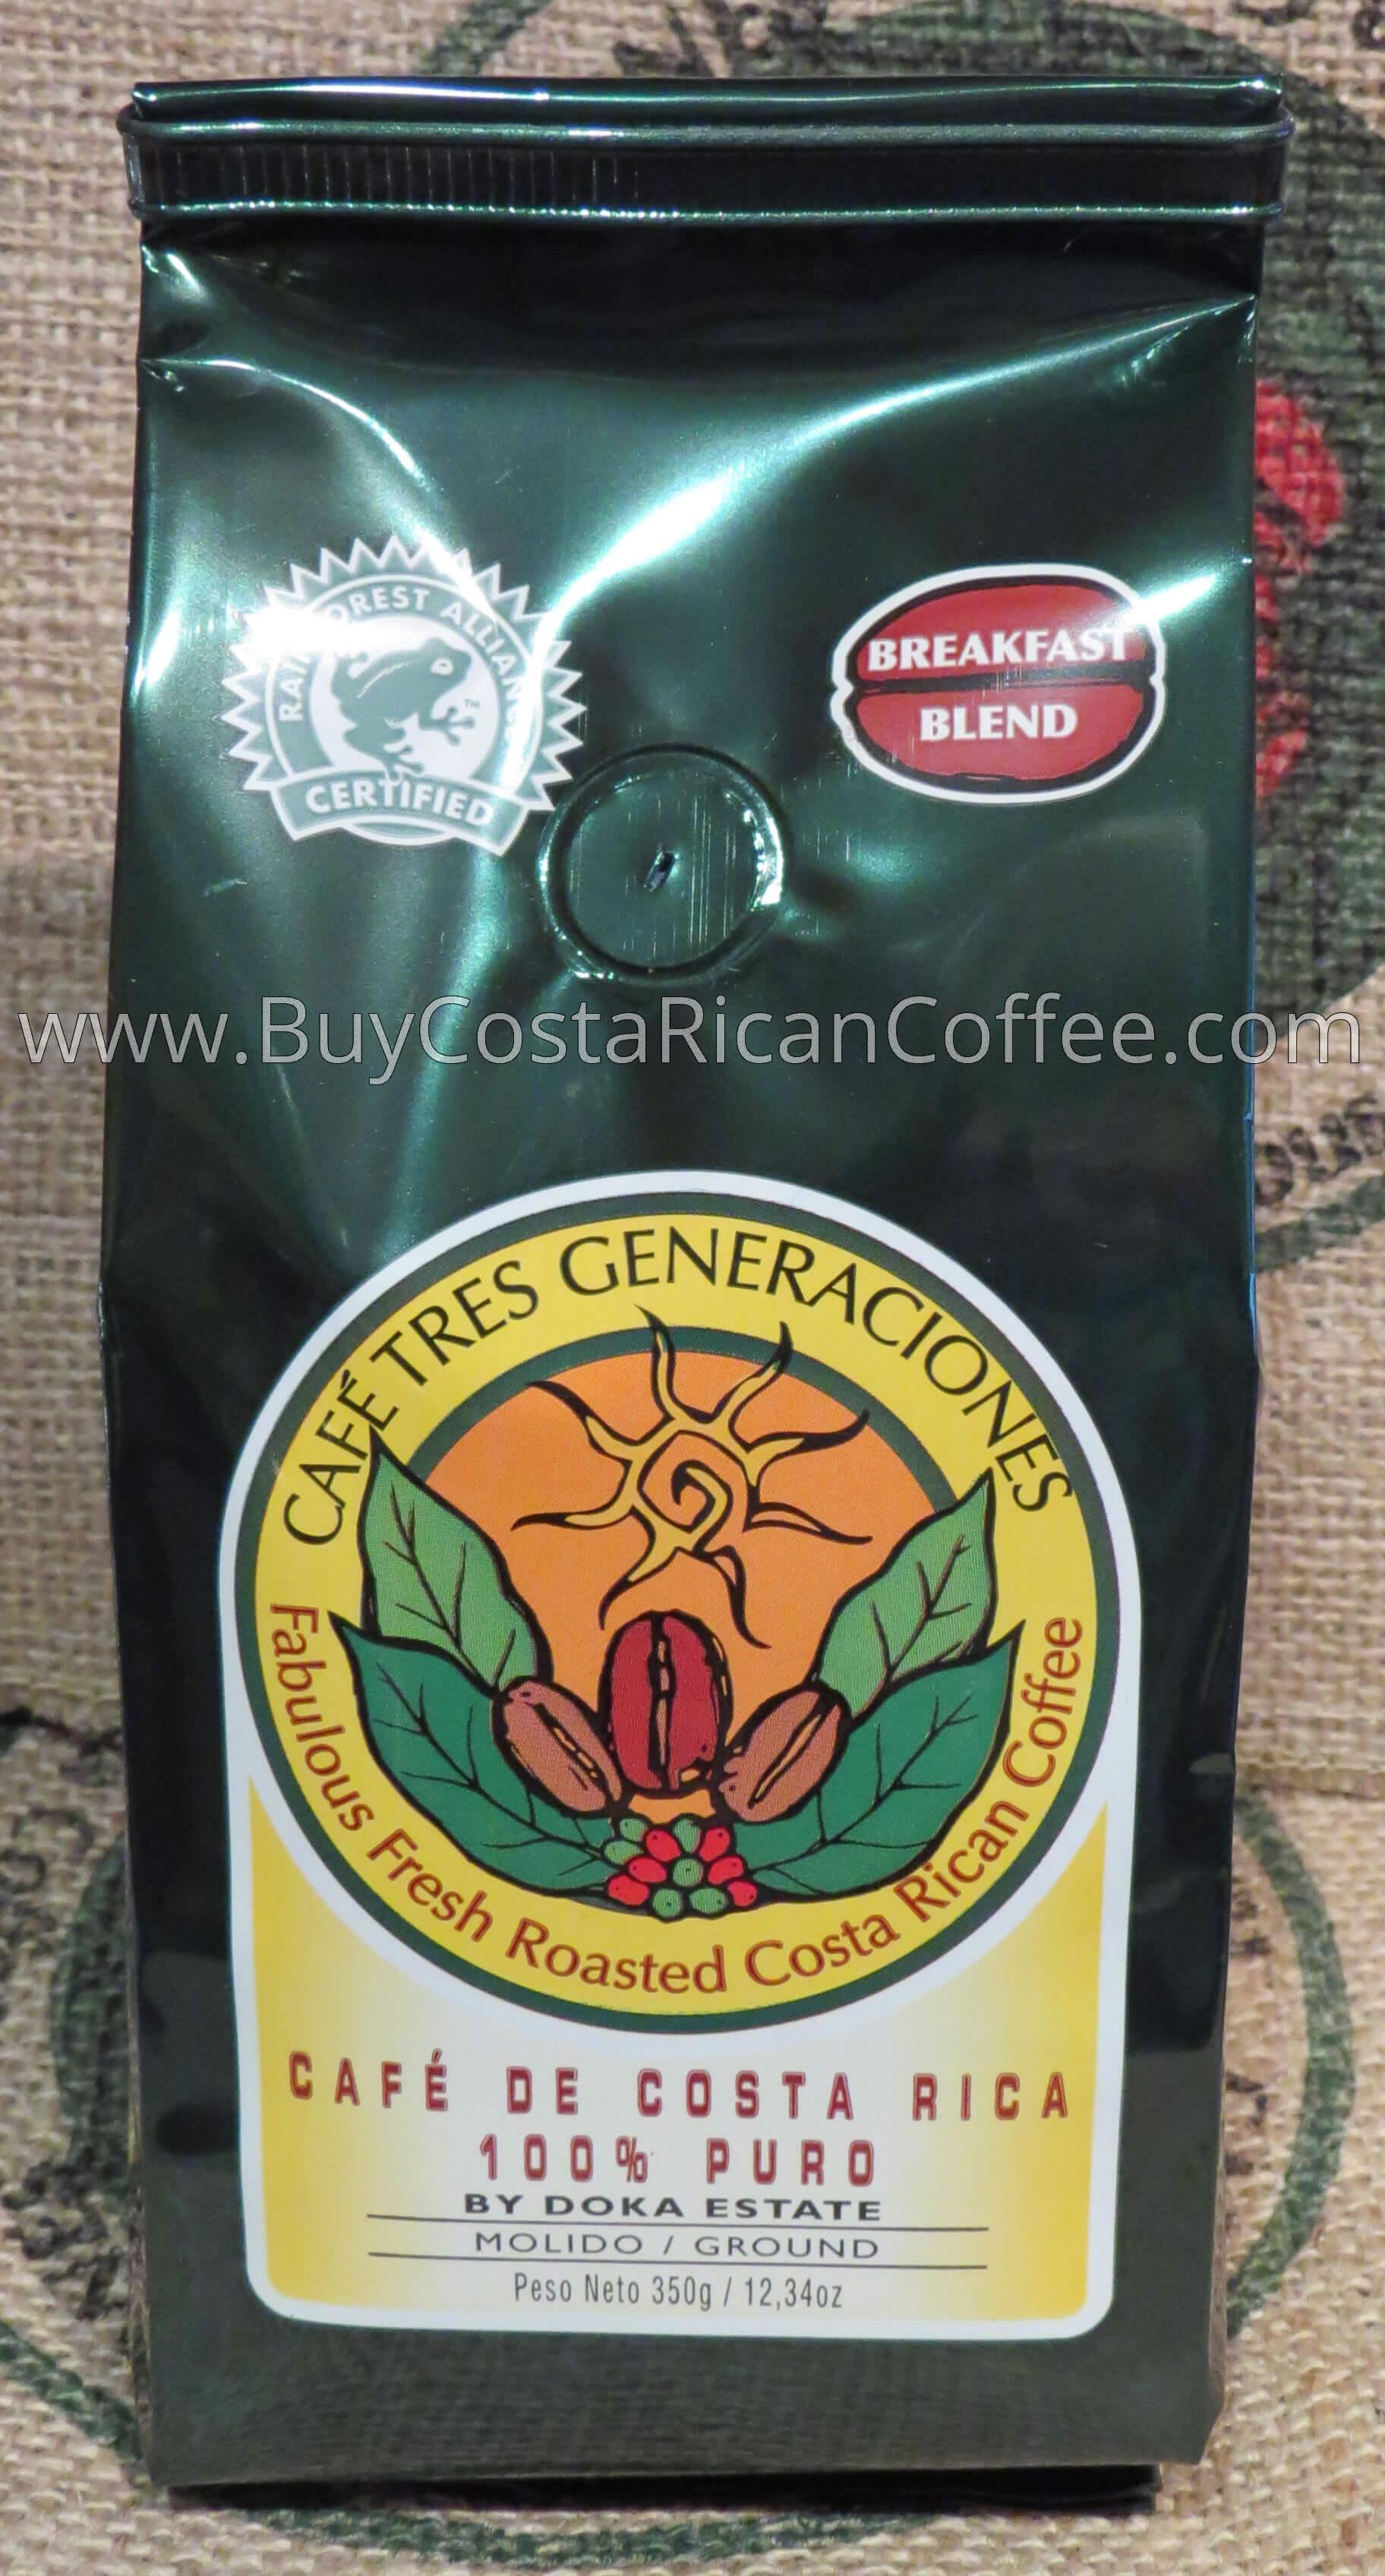 Buy Costa Rican Coffee Online